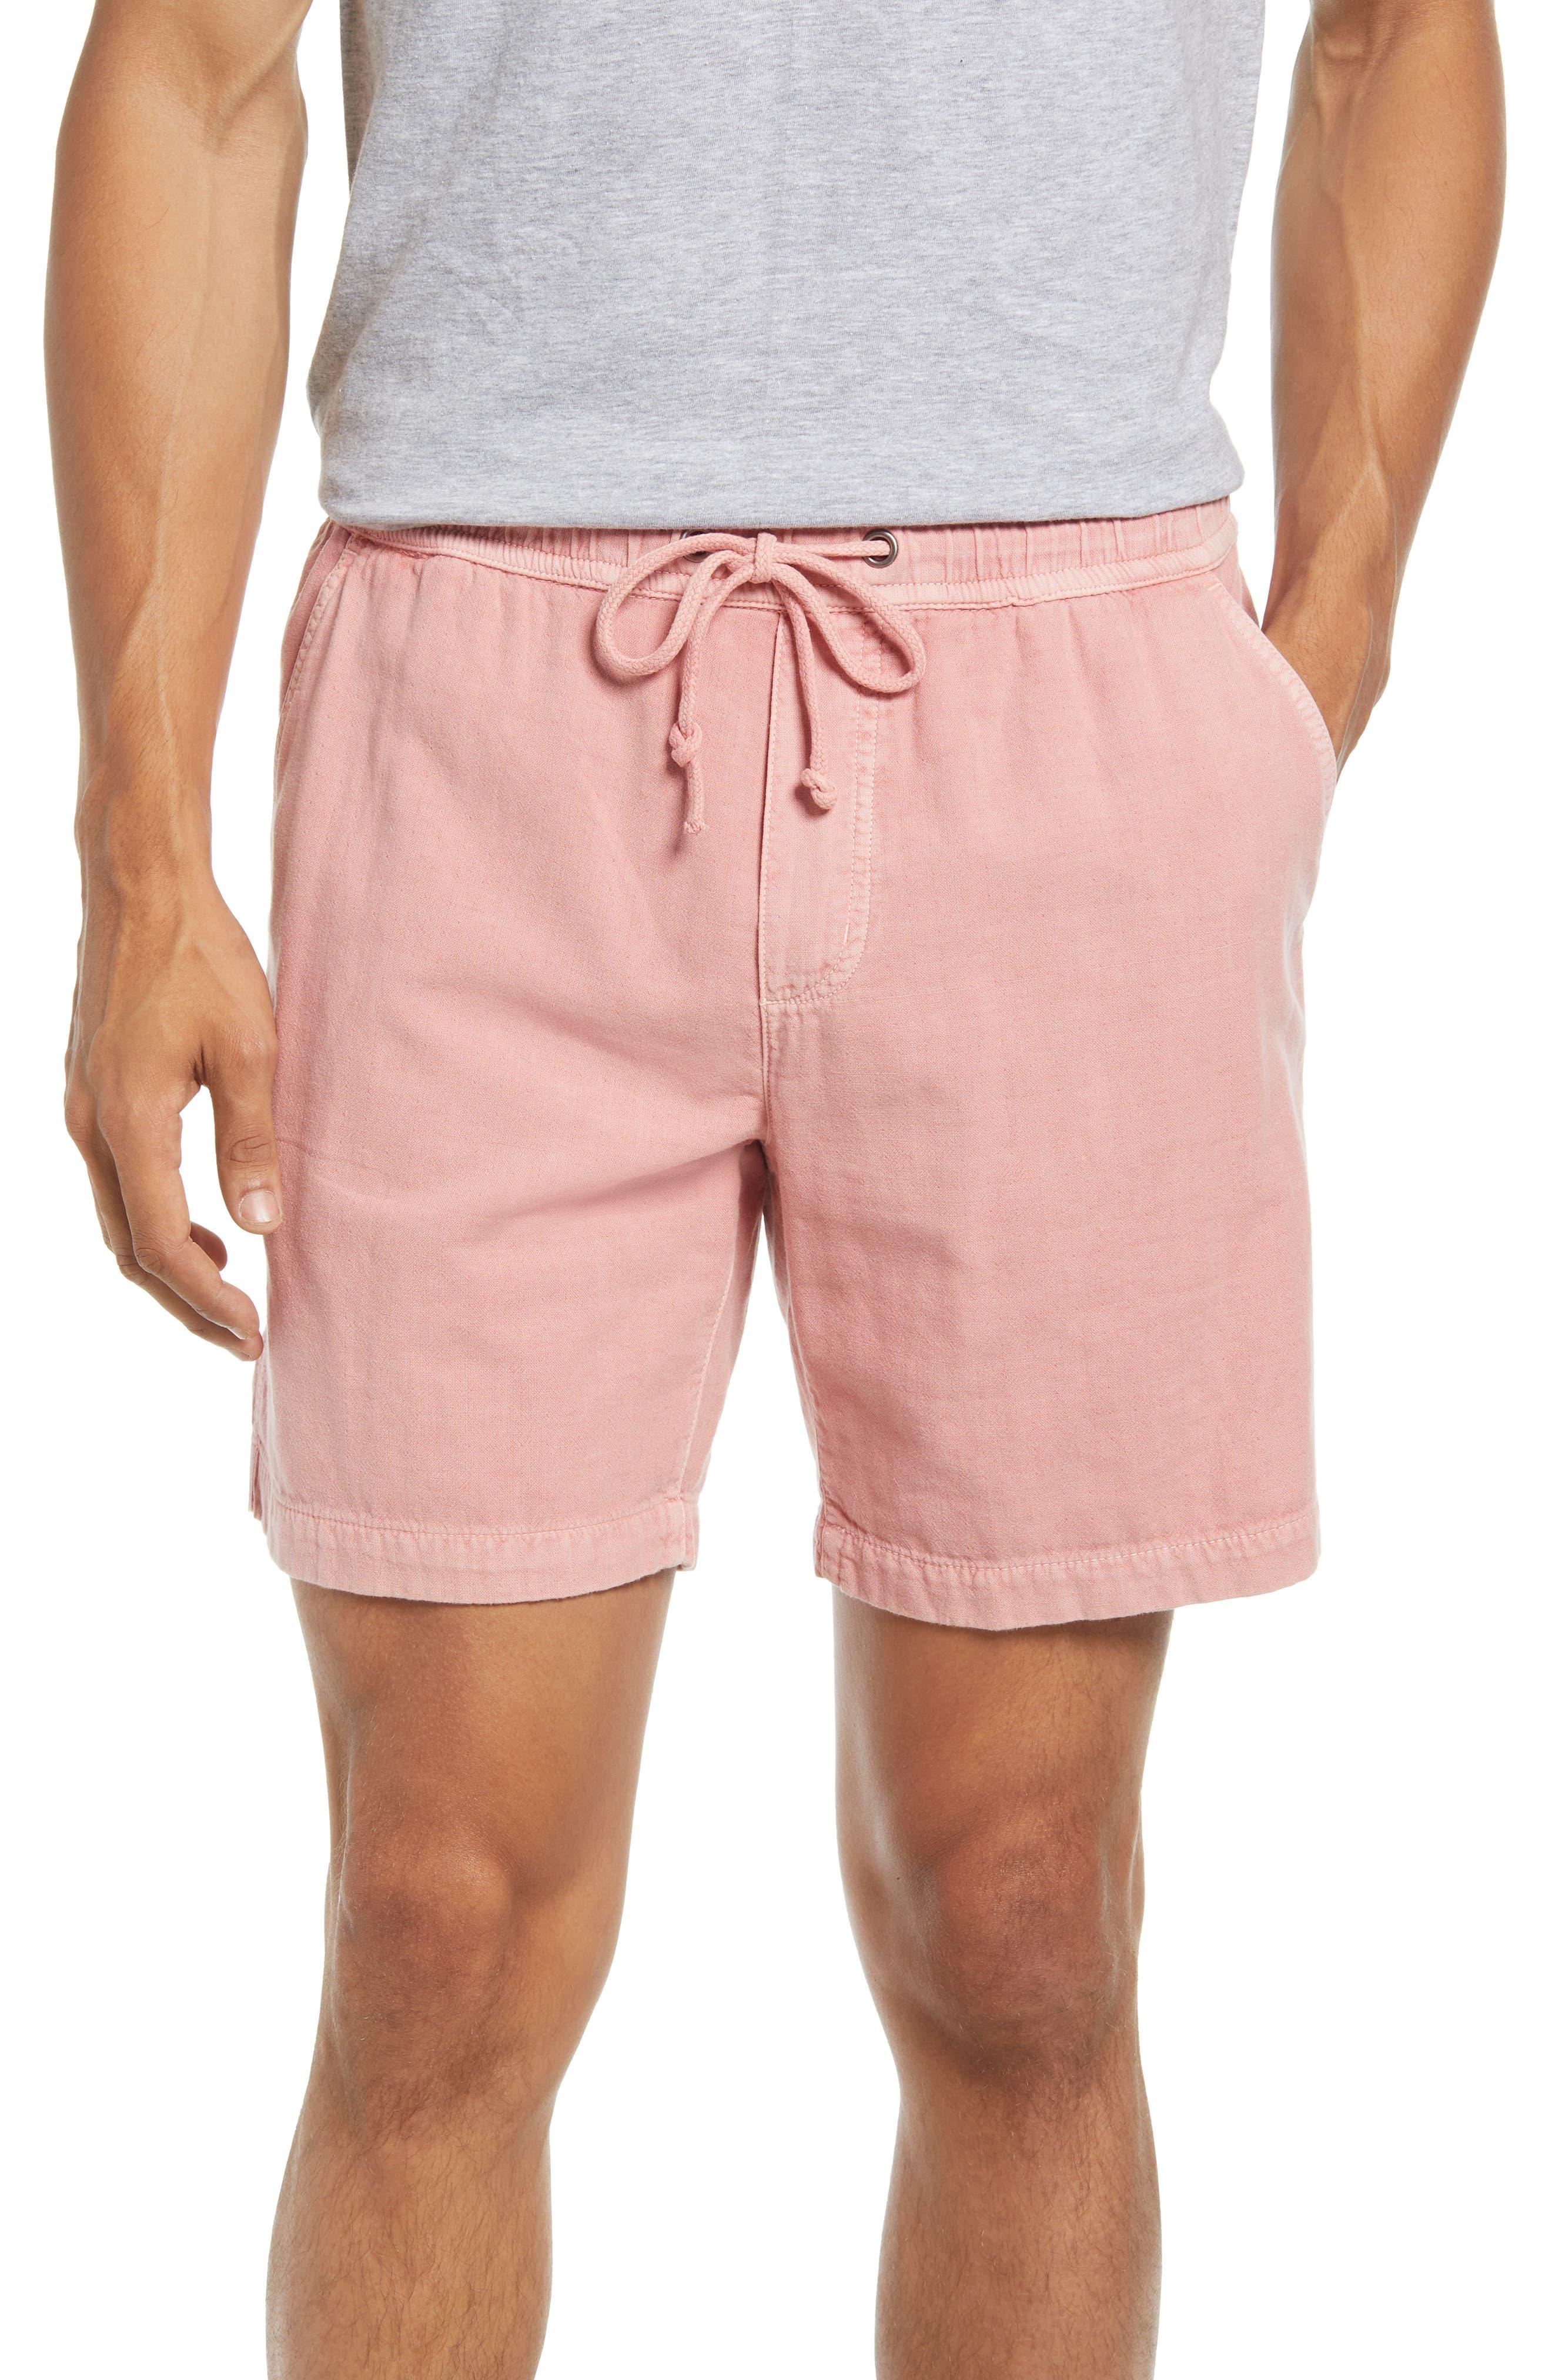 Saturday Beach Cotton Drawstring Shorts